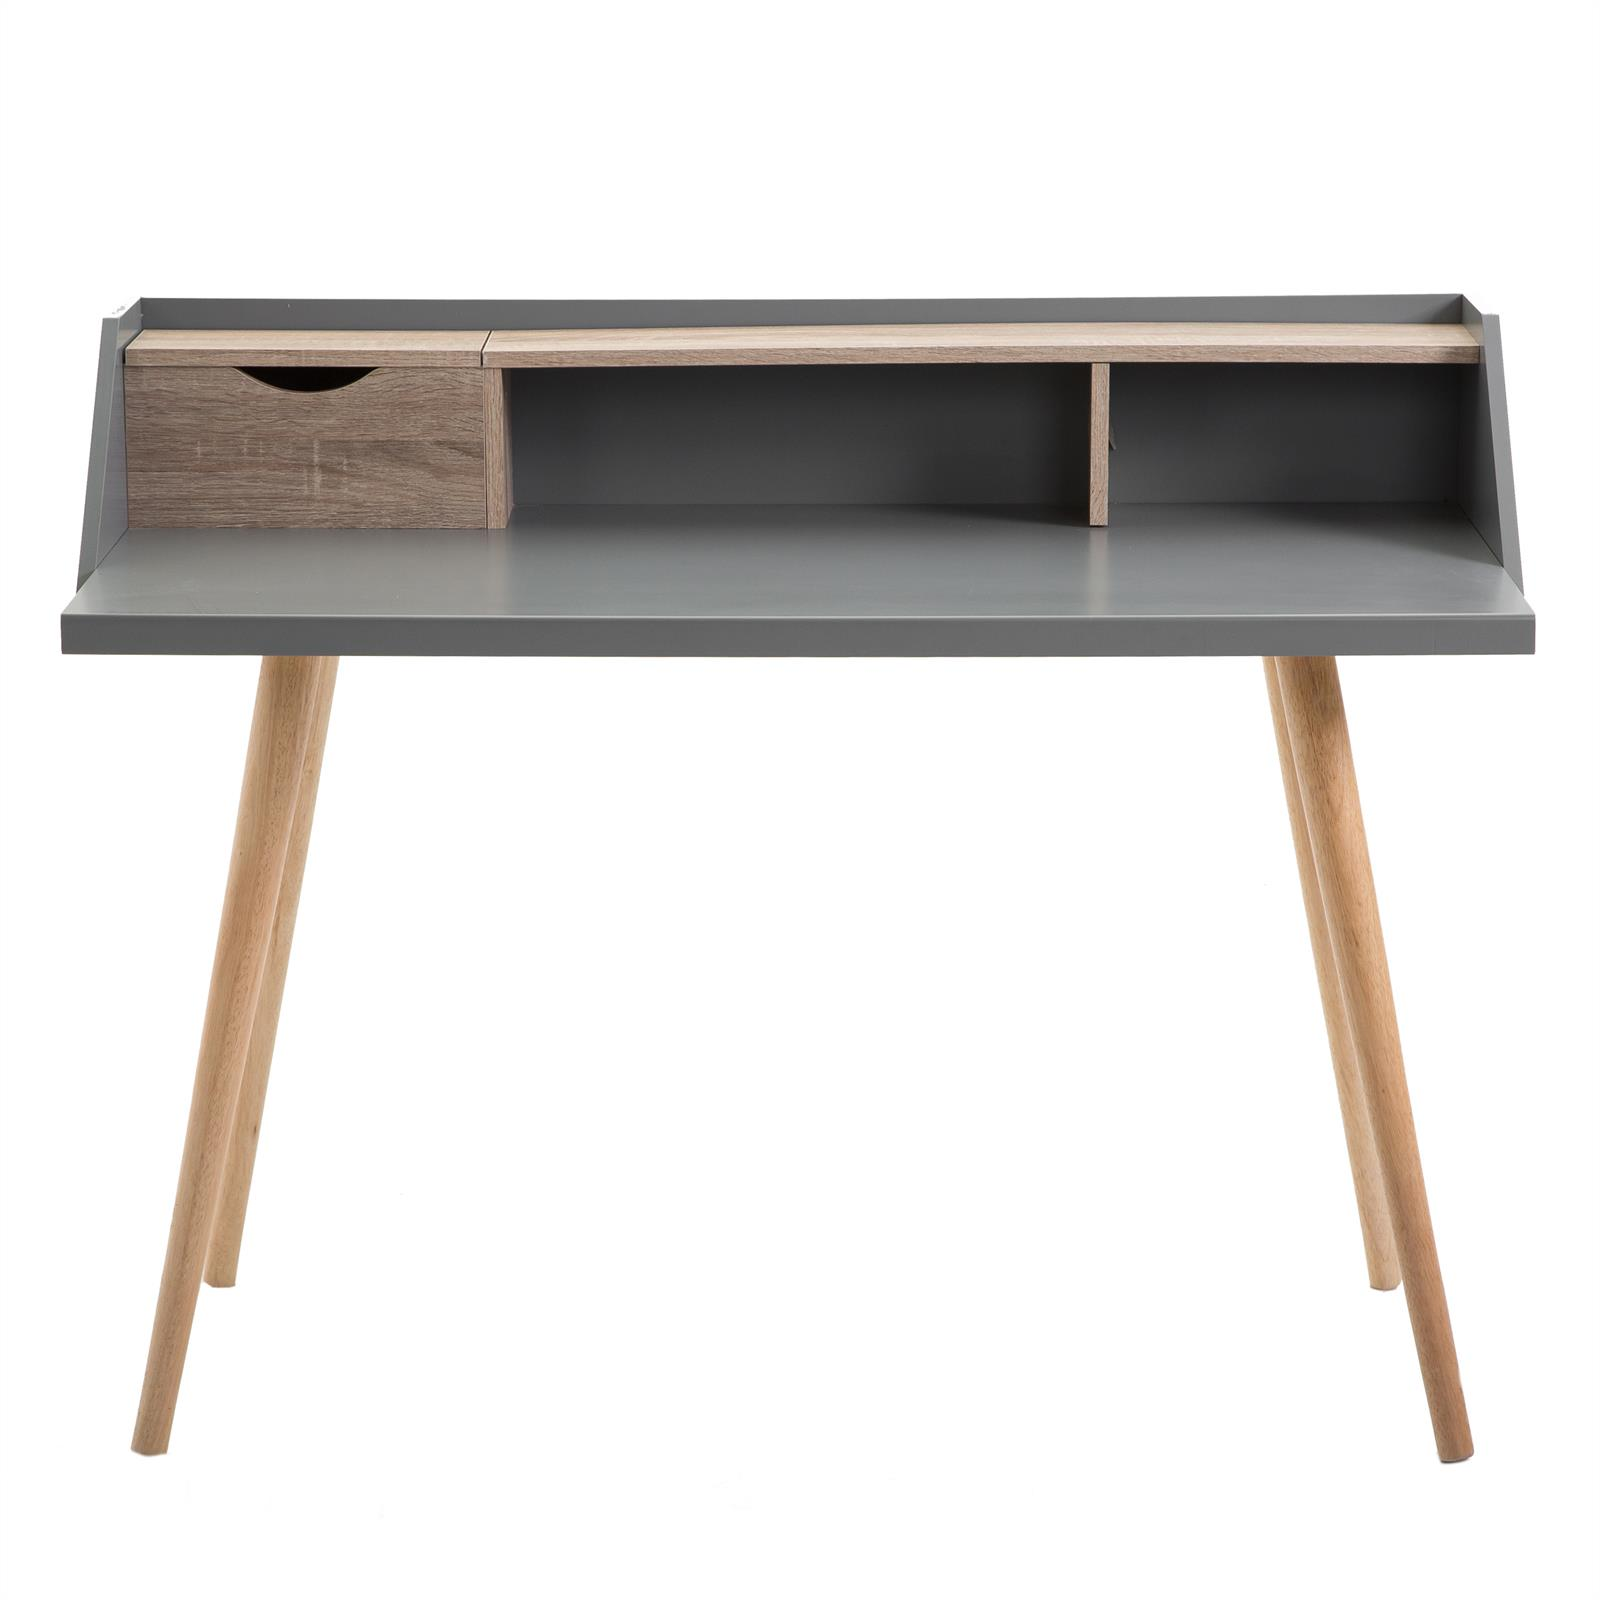 konsolentisch sekret r joan sonoma eiche grau mobilia24. Black Bedroom Furniture Sets. Home Design Ideas